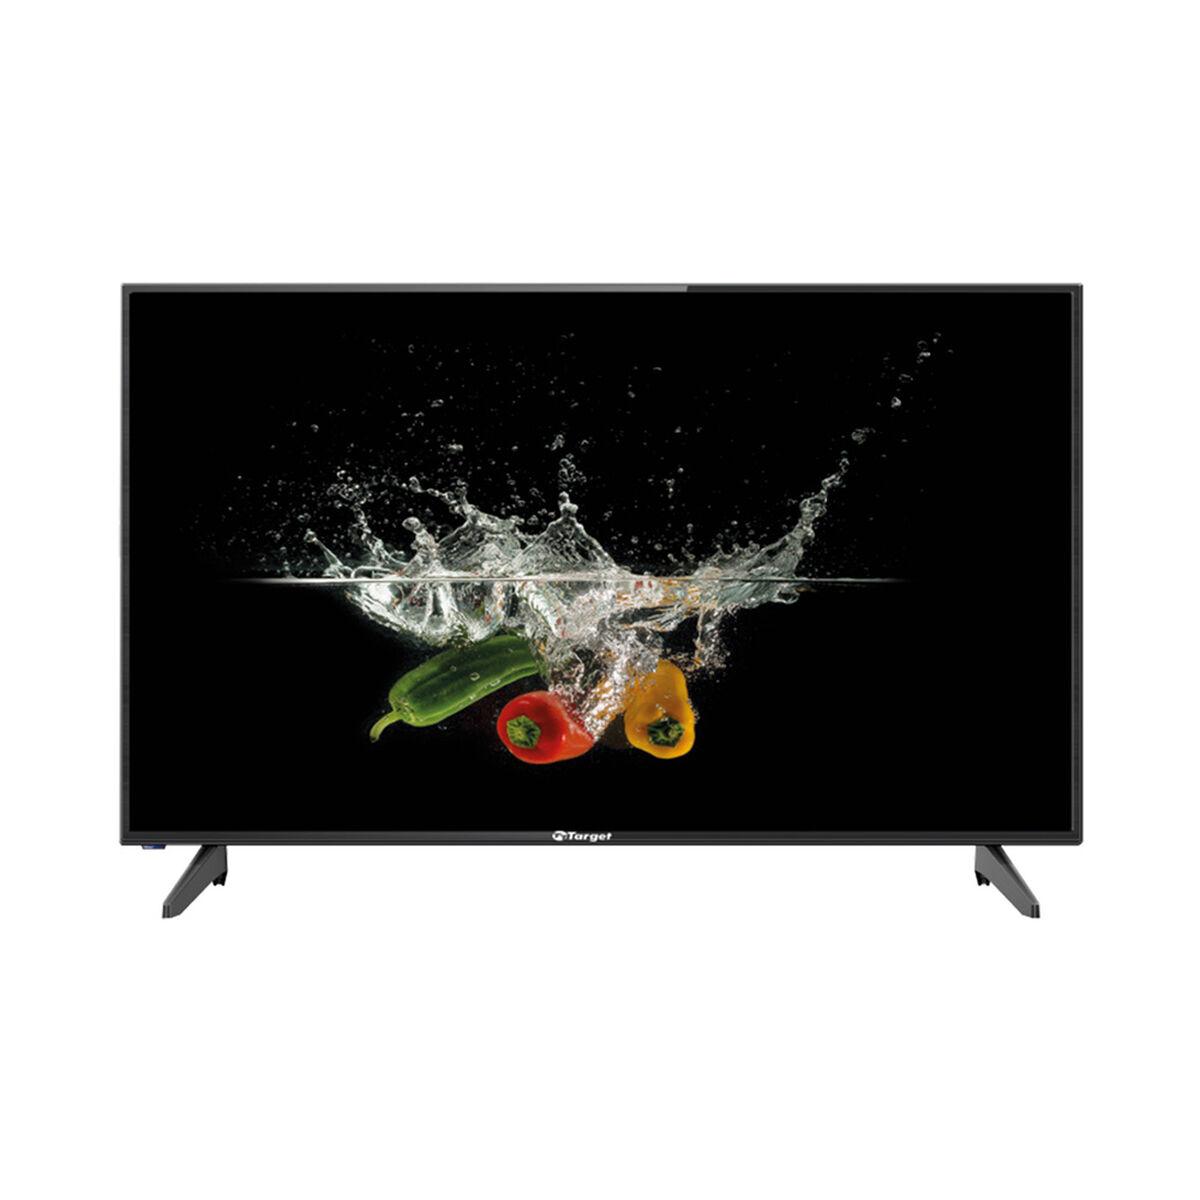 "DLED 32"" Target TT-32HDSM Smart TV HD"